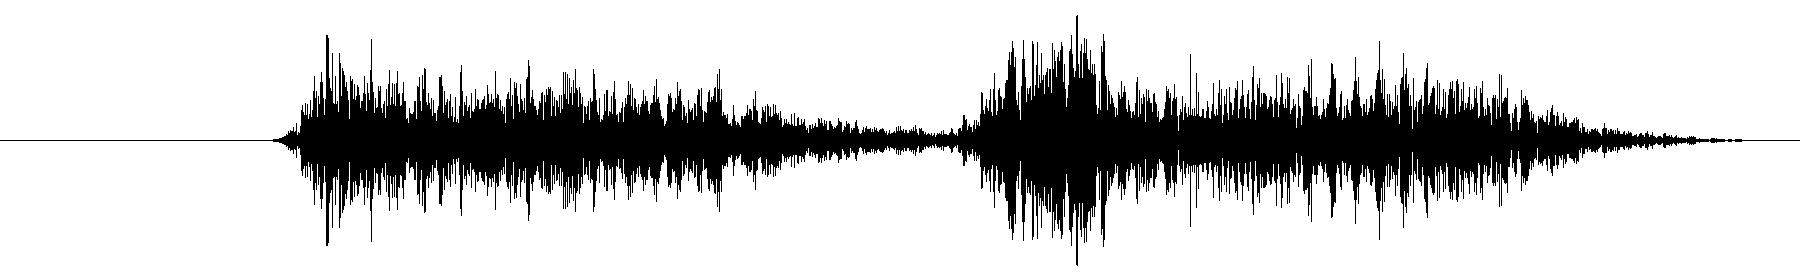 vox 026